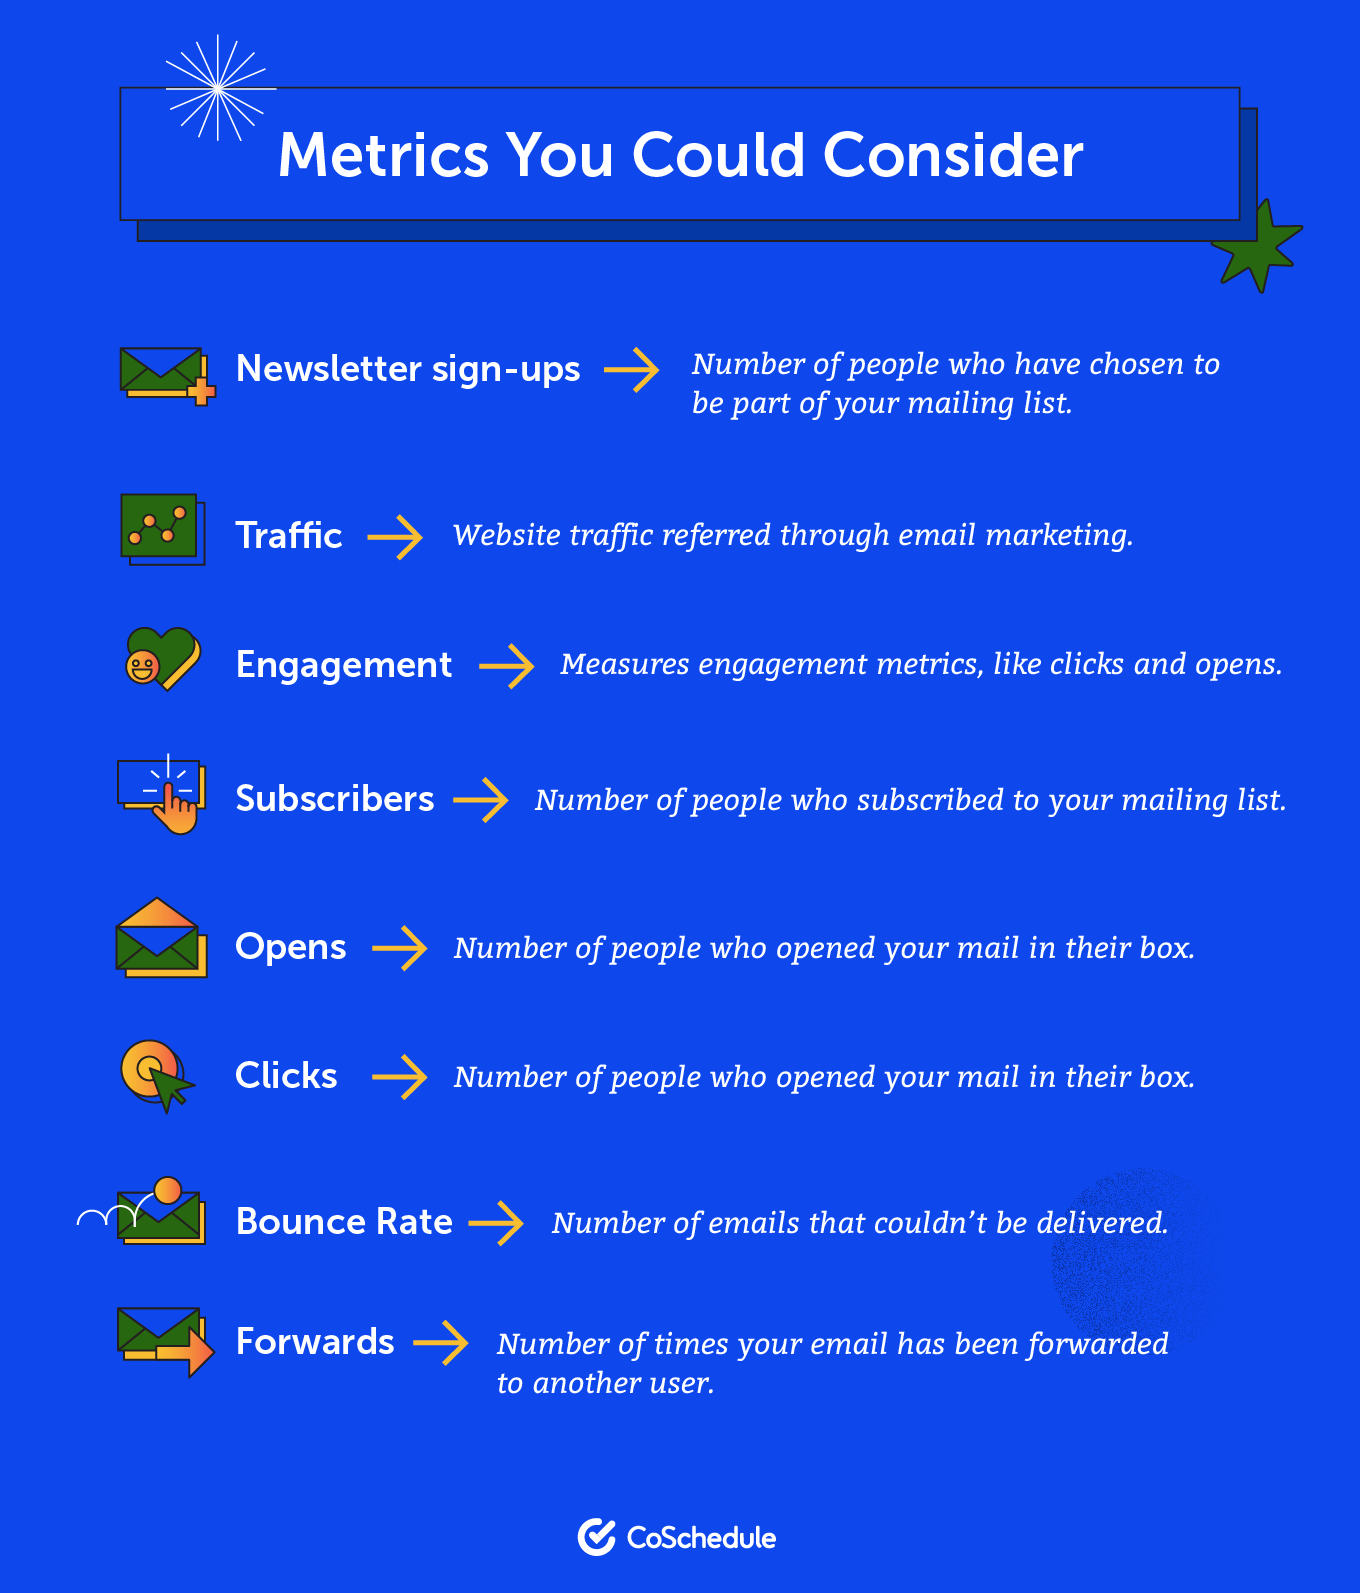 Metrics to consider